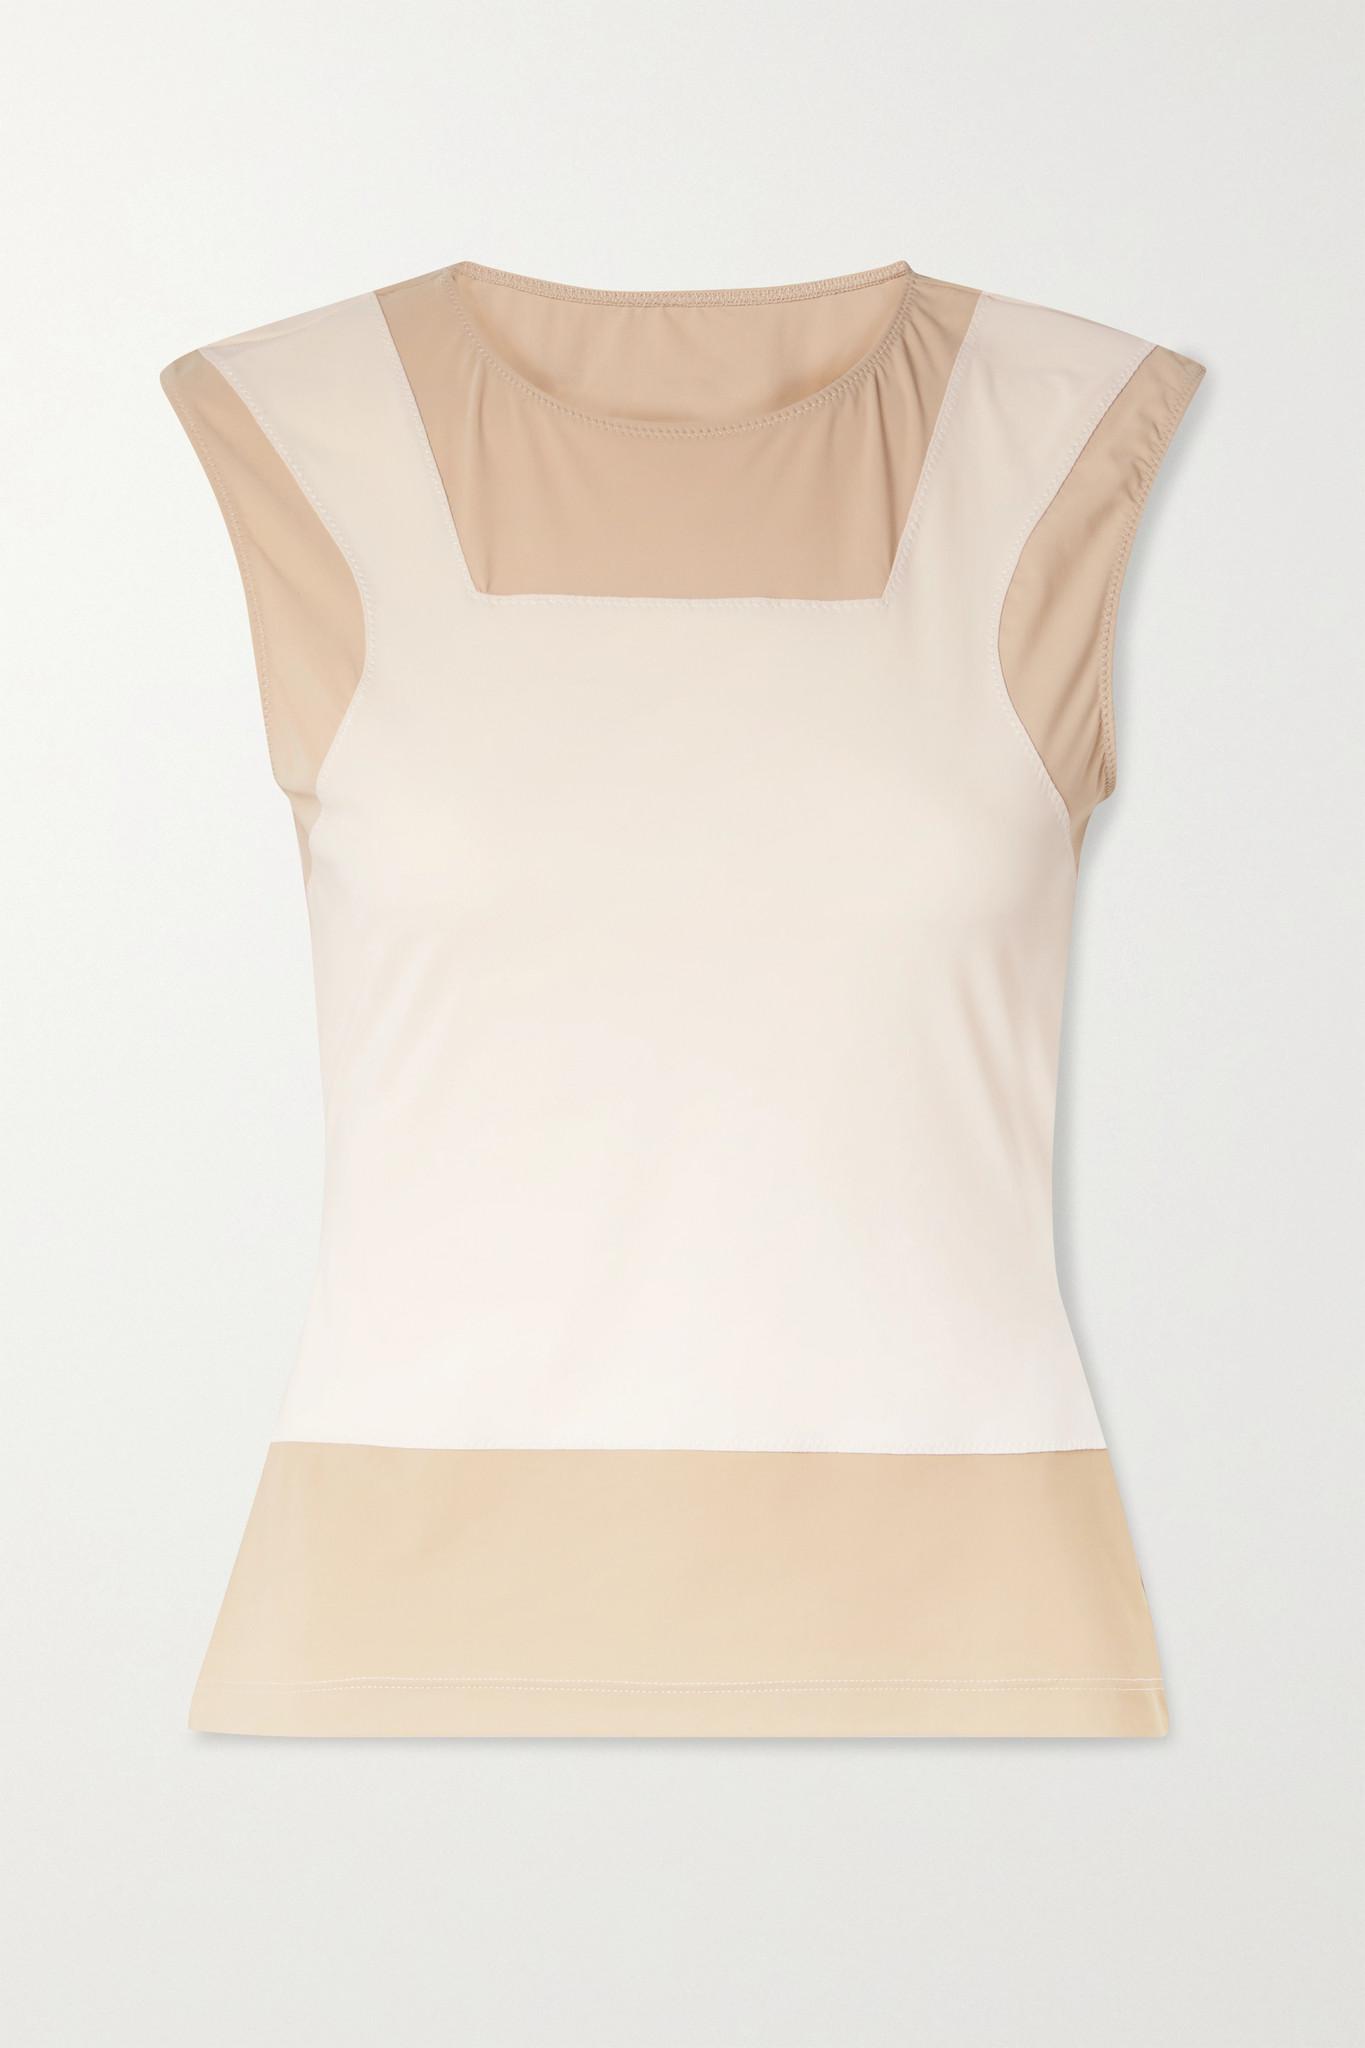 MM6 MAISON MARGIELA - Trompe-l'ail 拼色弹力平纹布上衣 - 白色 - x small